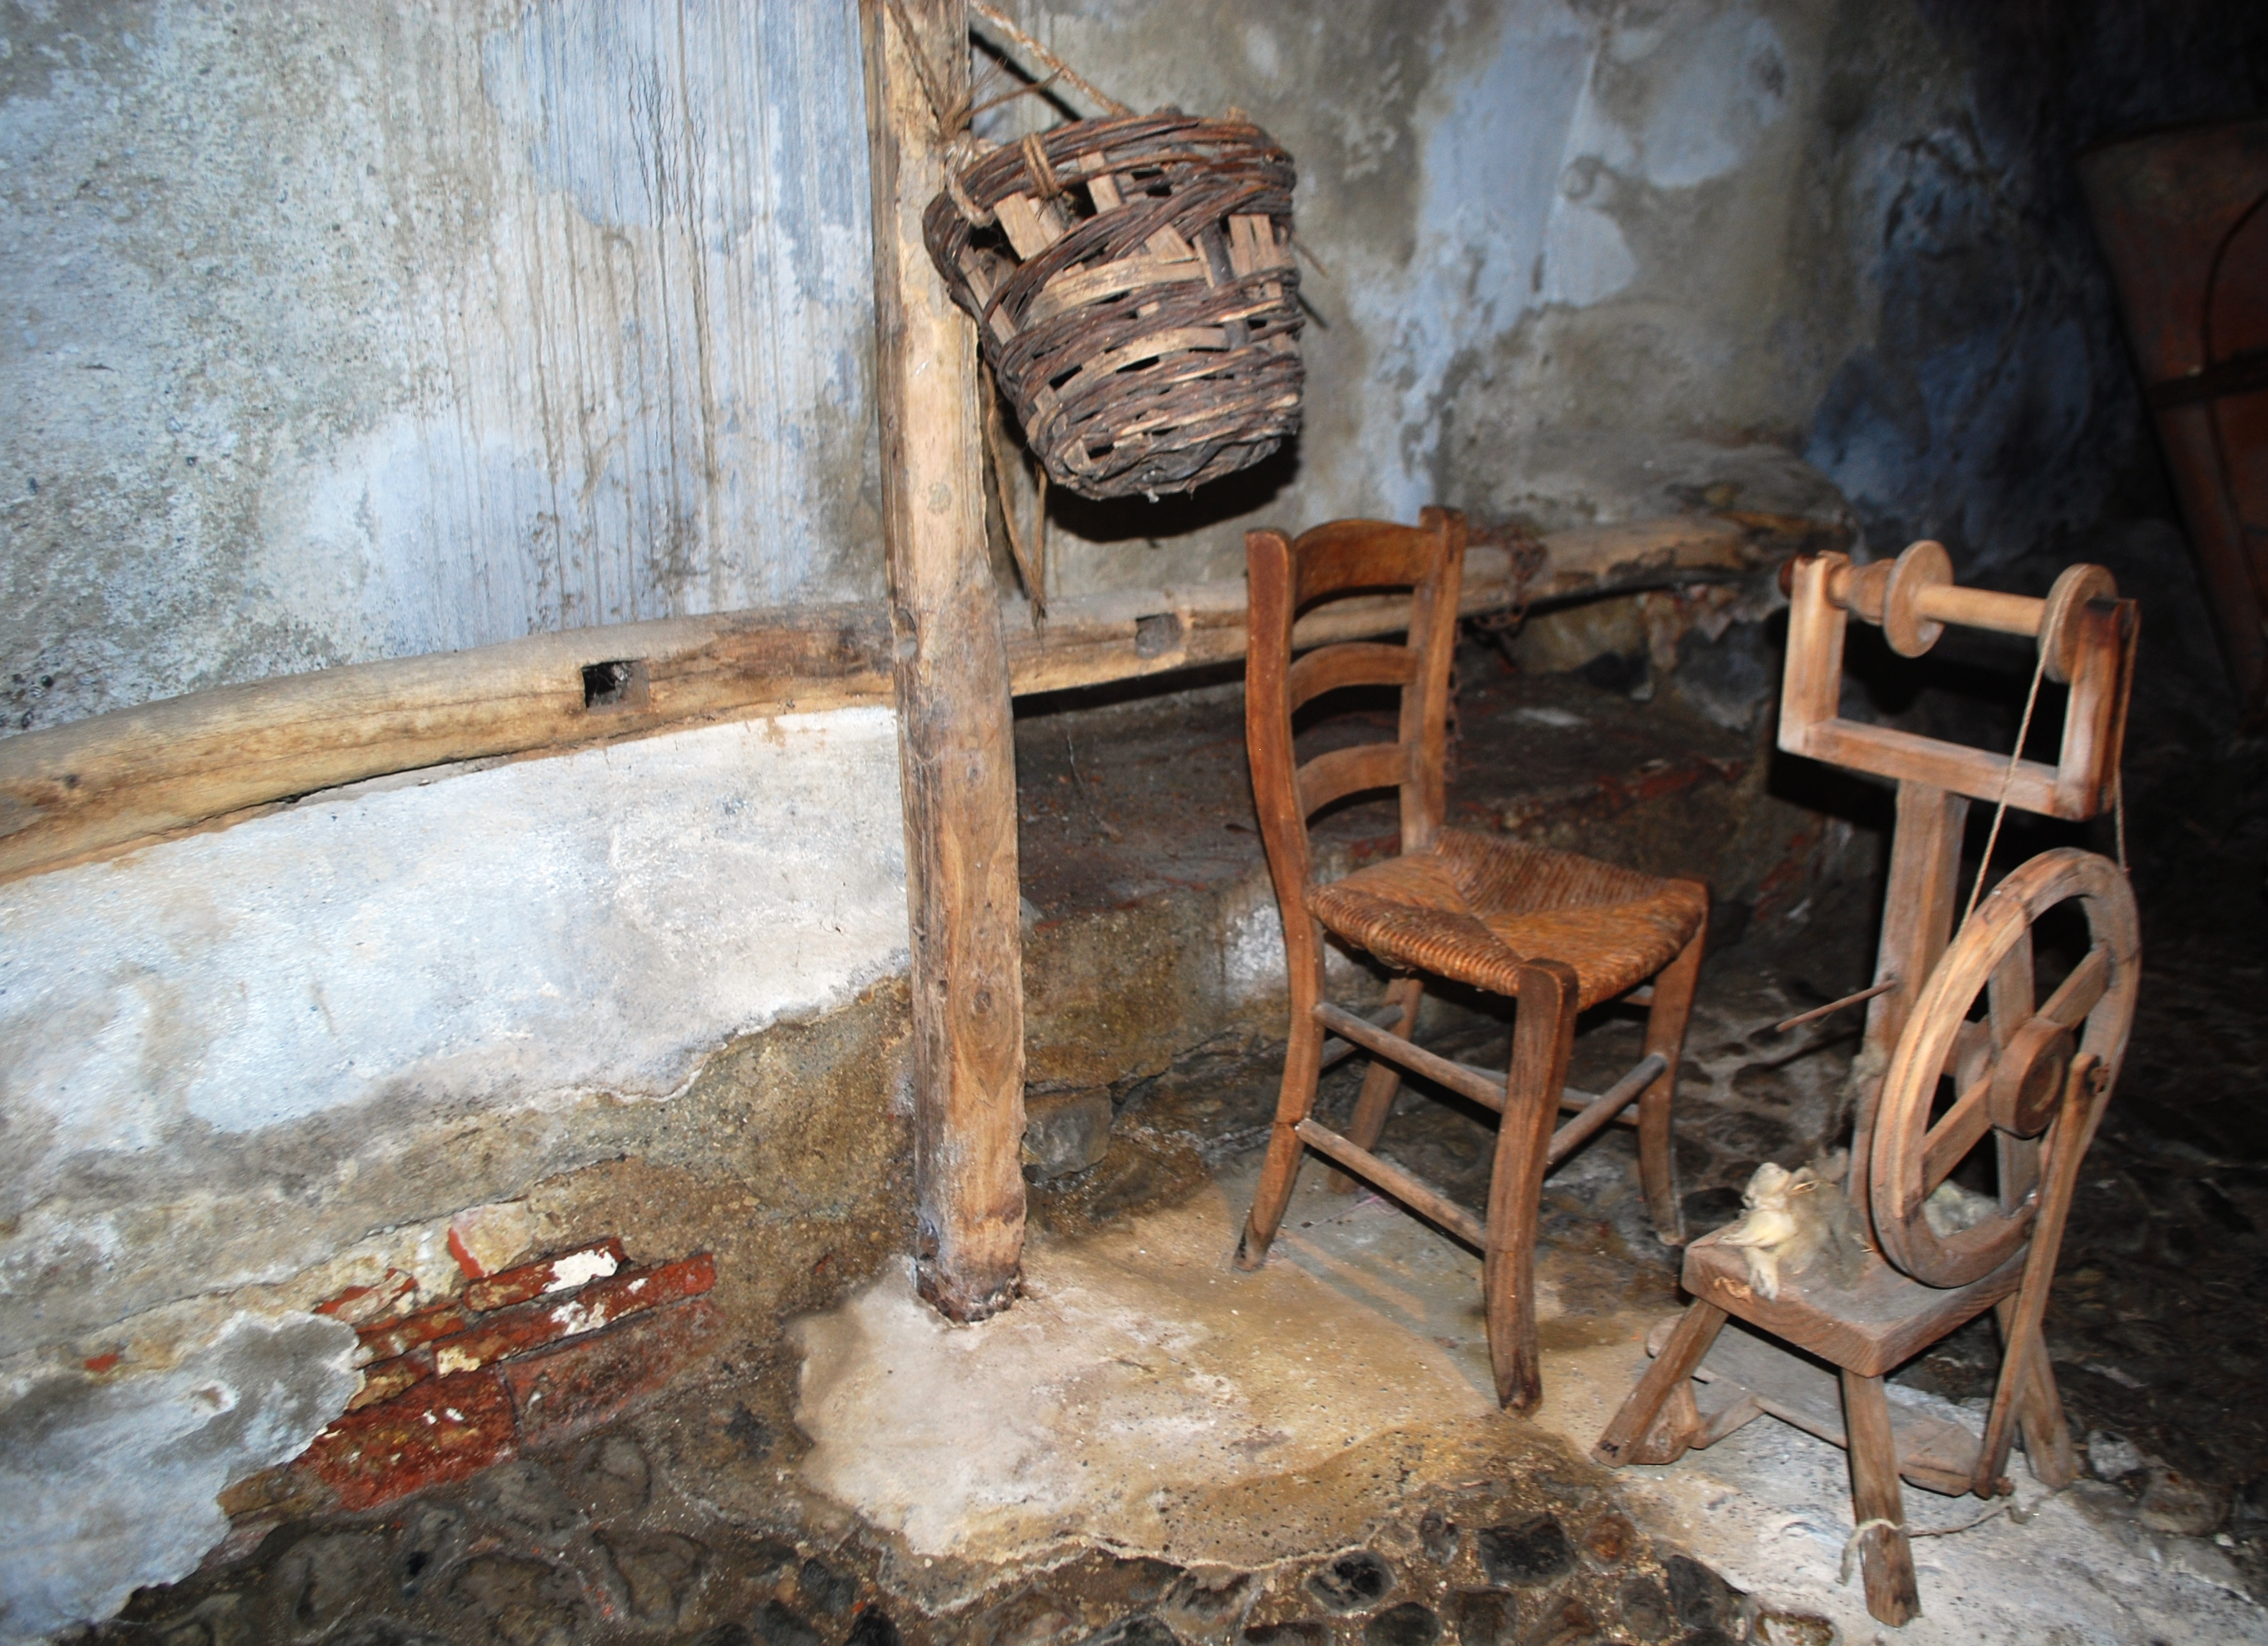 Visita al Museo Etnografico dell'Alta Brianza